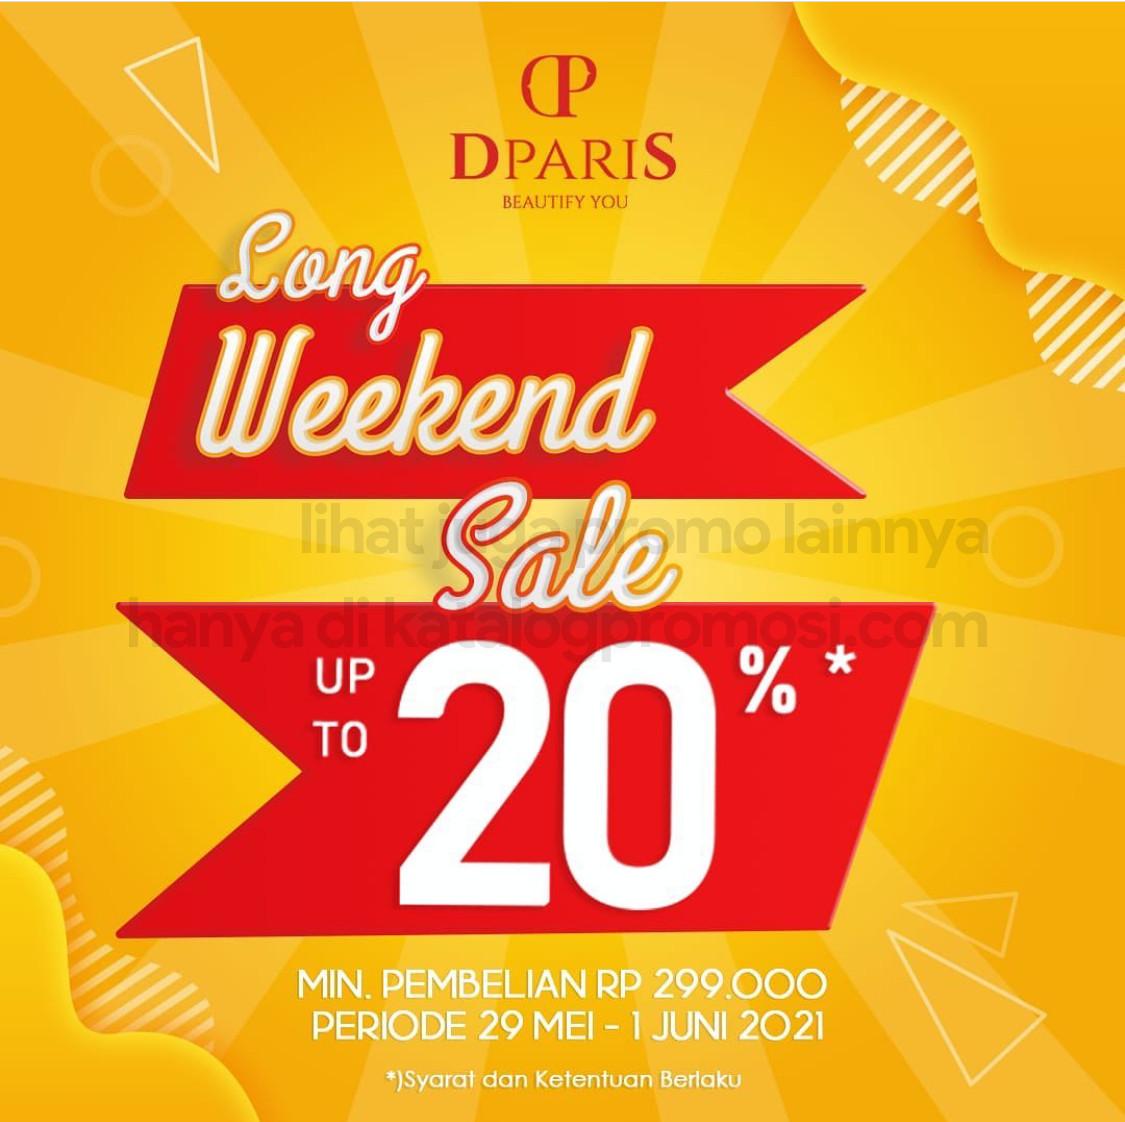 Promo DPARIS LONG WEEKEND SALE! Special discount up to 20%, berlaku mulai tanggal 29 Mei - 01 Juni 2021